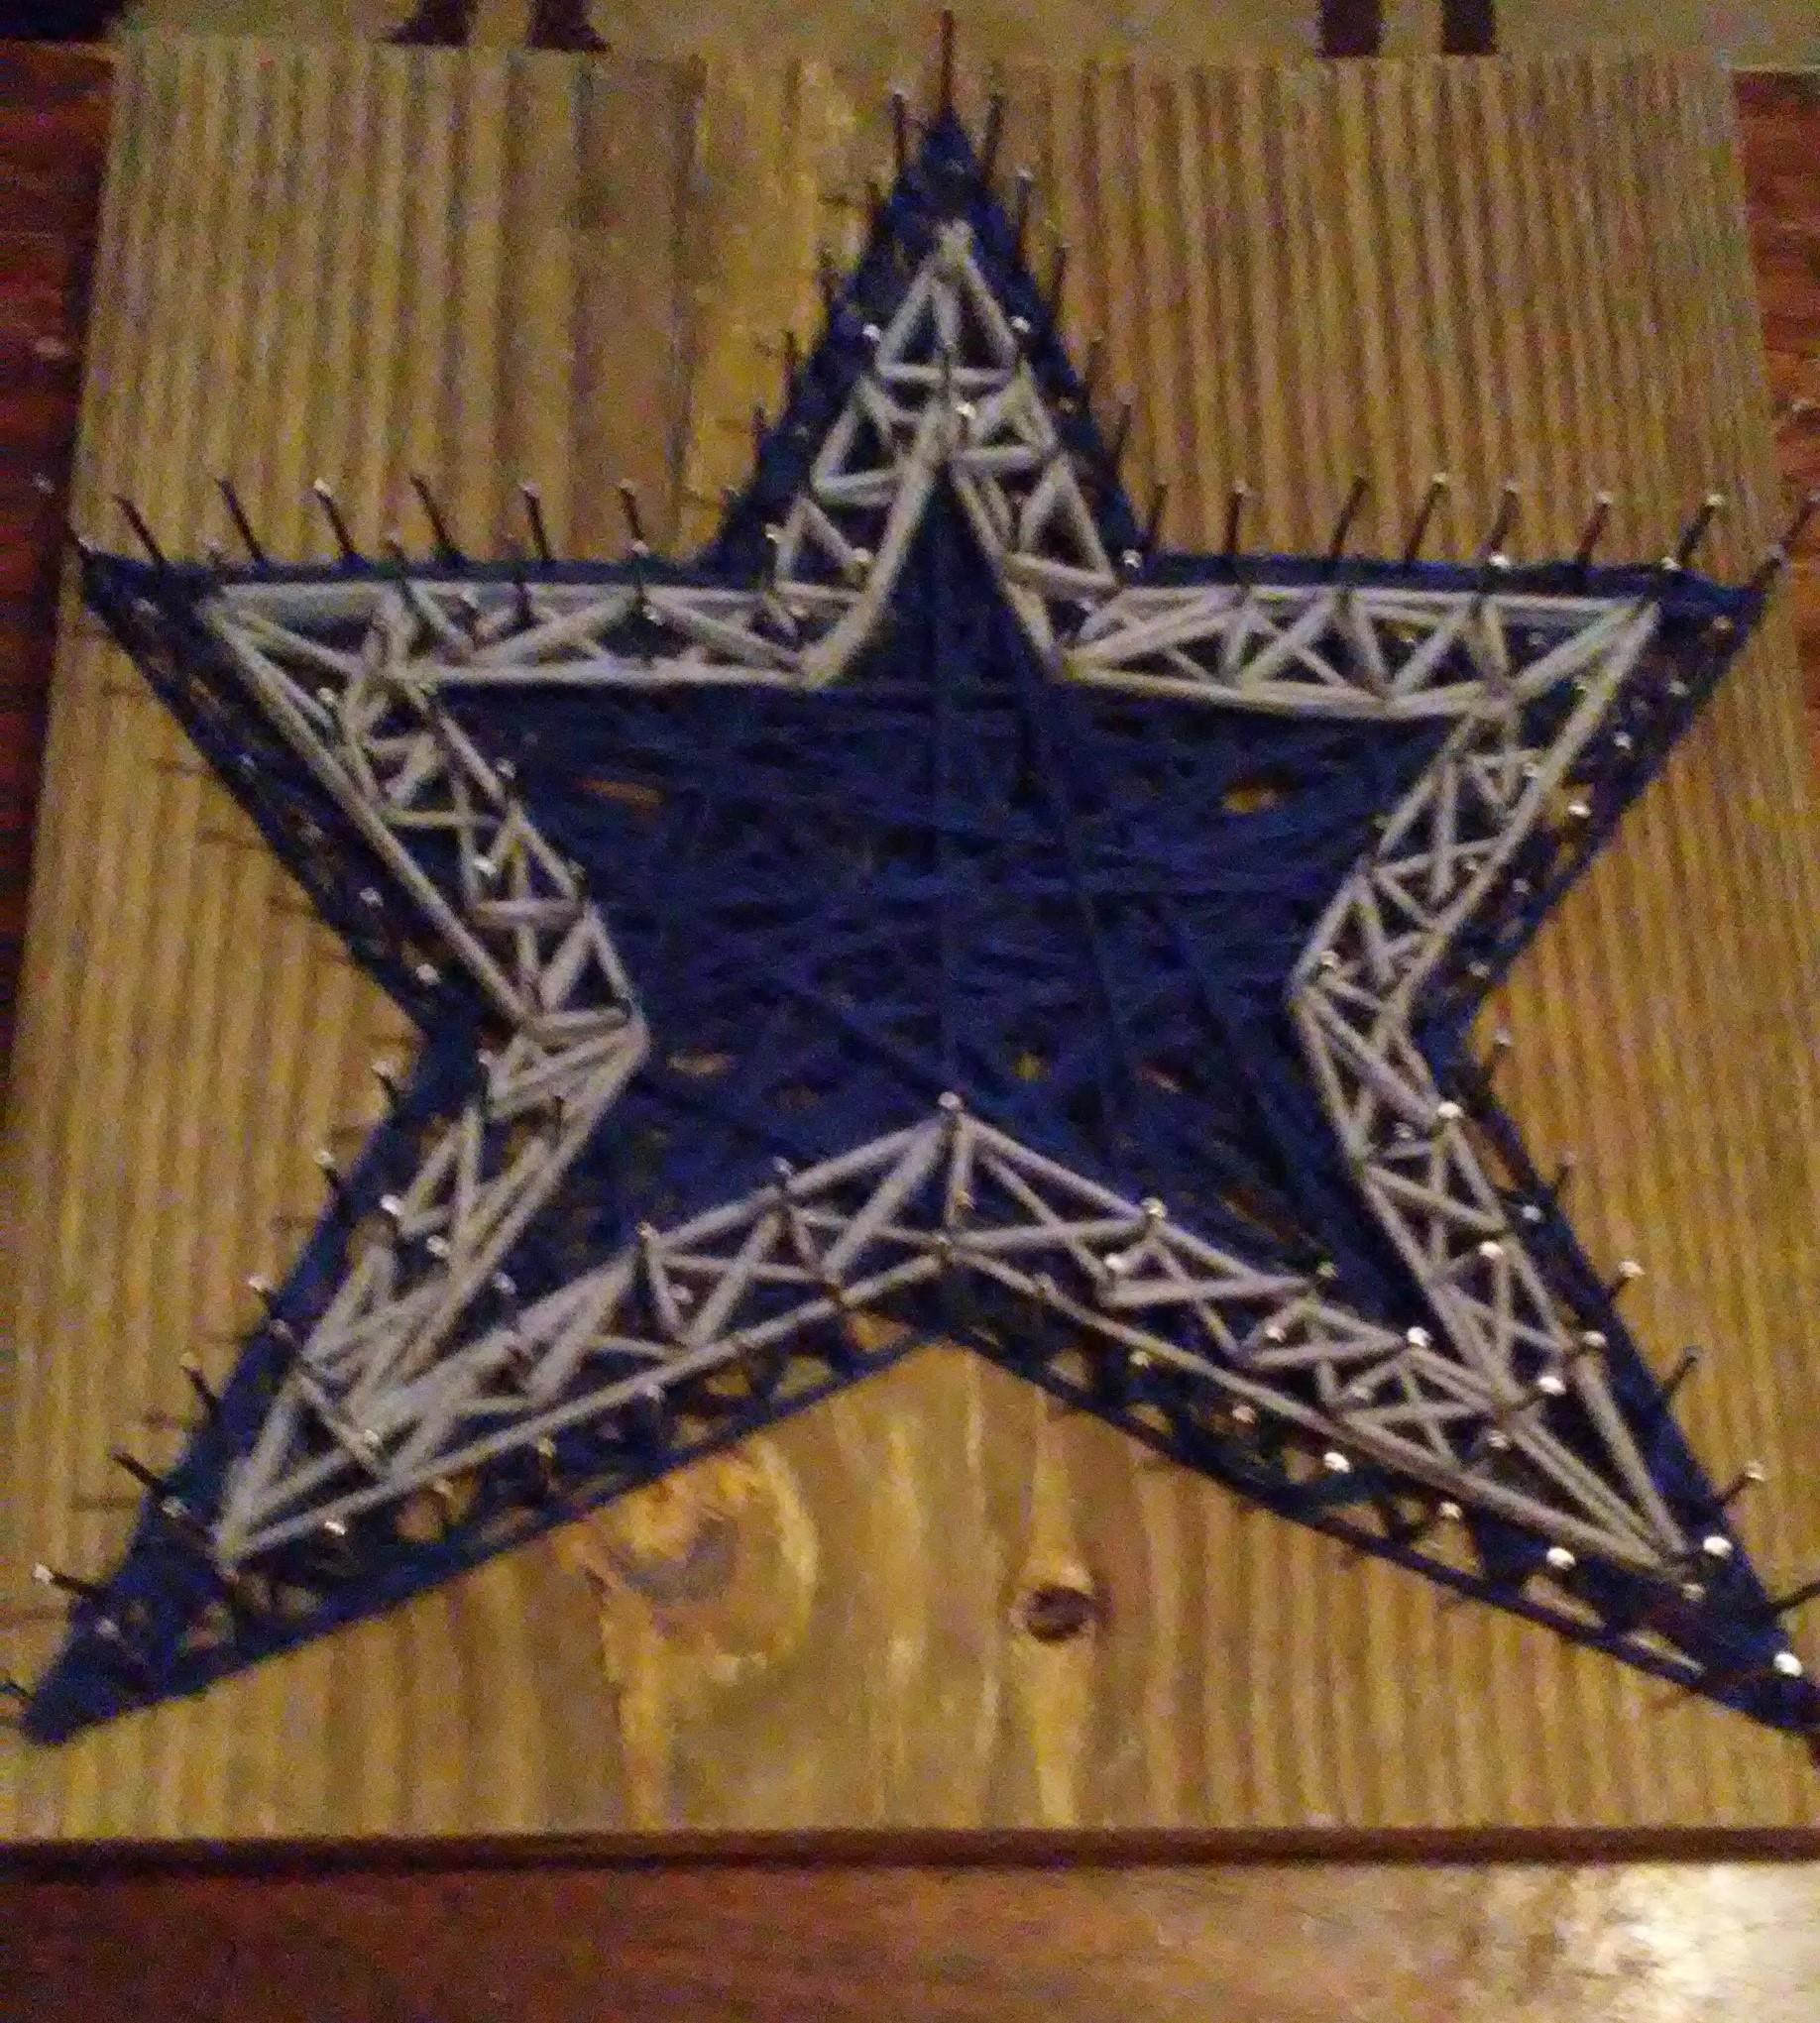 12x12 String Art Dallas Cowboys Star on Storenvy fd46137b6